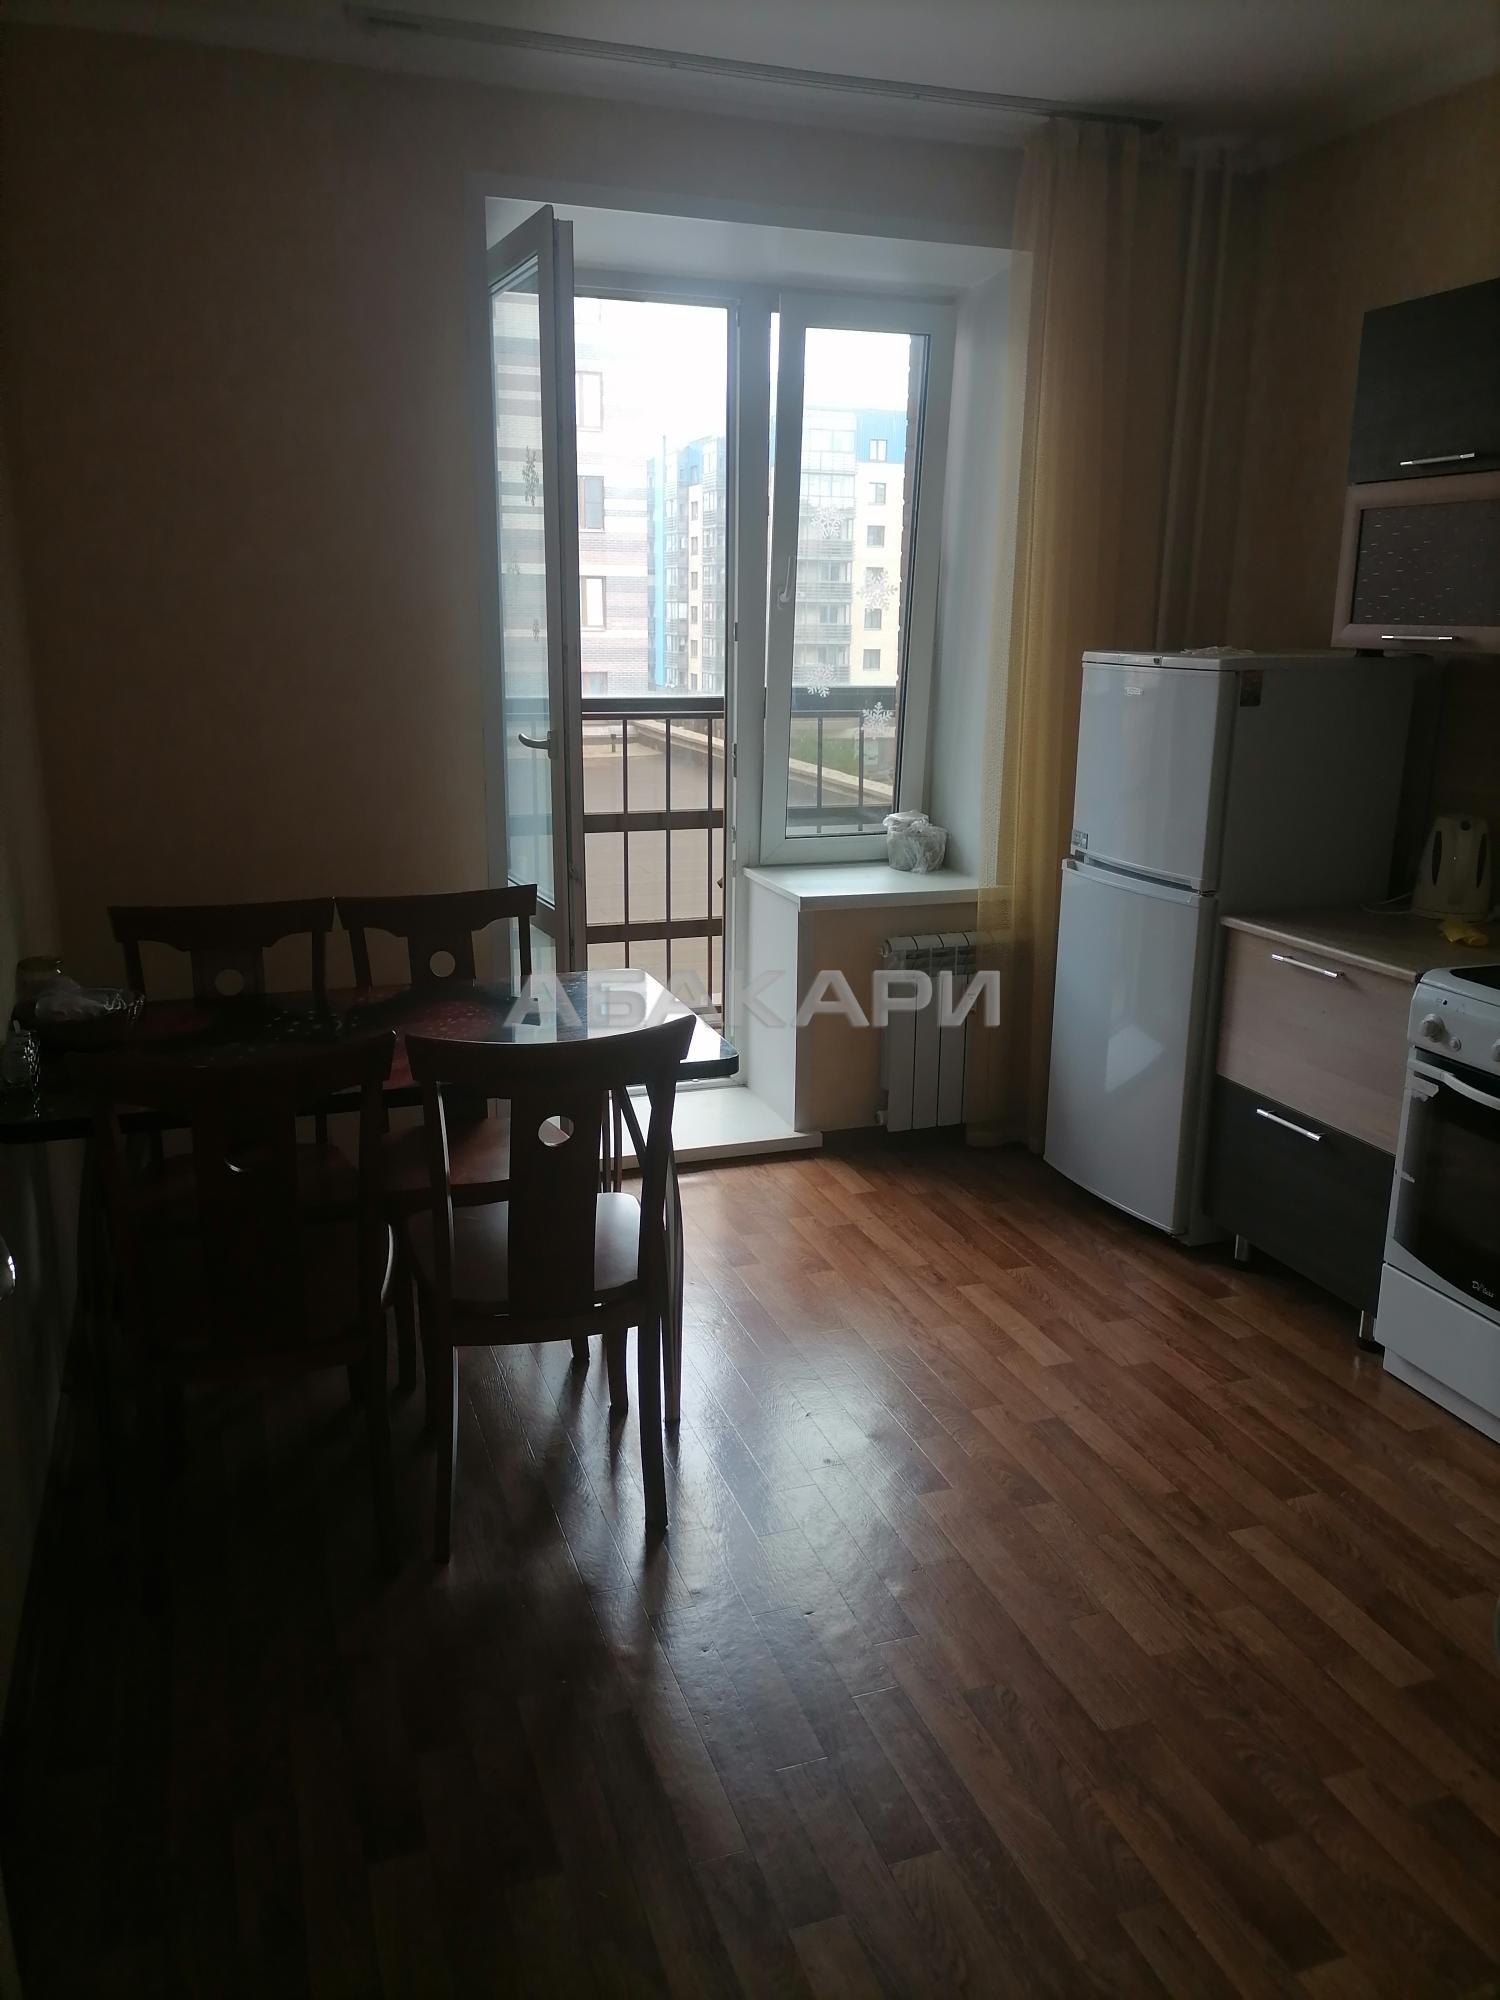 1к квартира Капитанская улица, 10 | 22000 | аренда в Красноярске фото 2